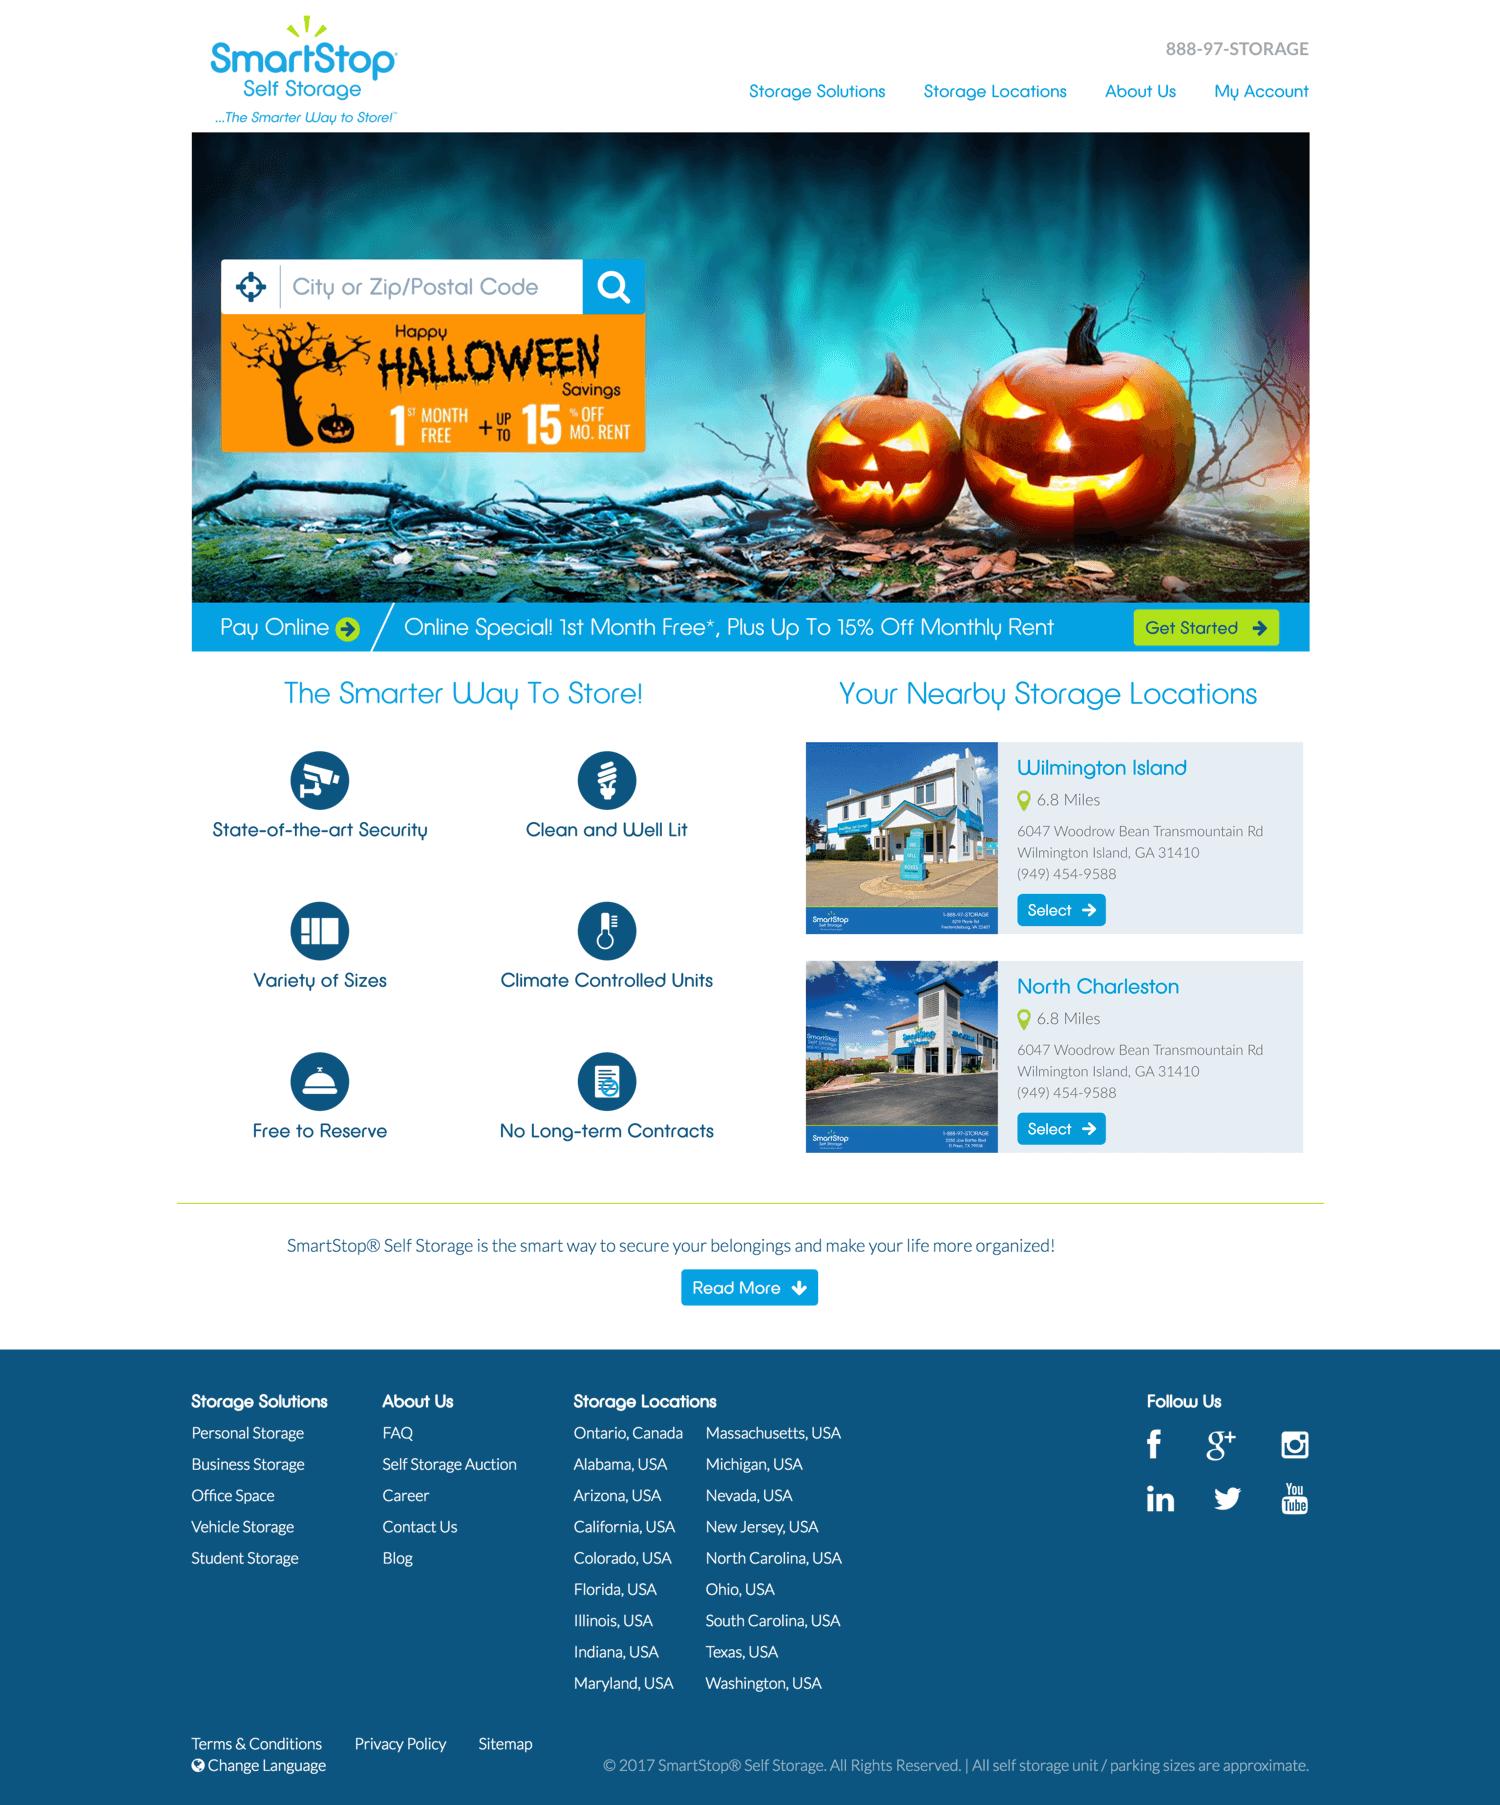 SmartStop-Self-Storage-Units-Website-Design-Home-Page-03